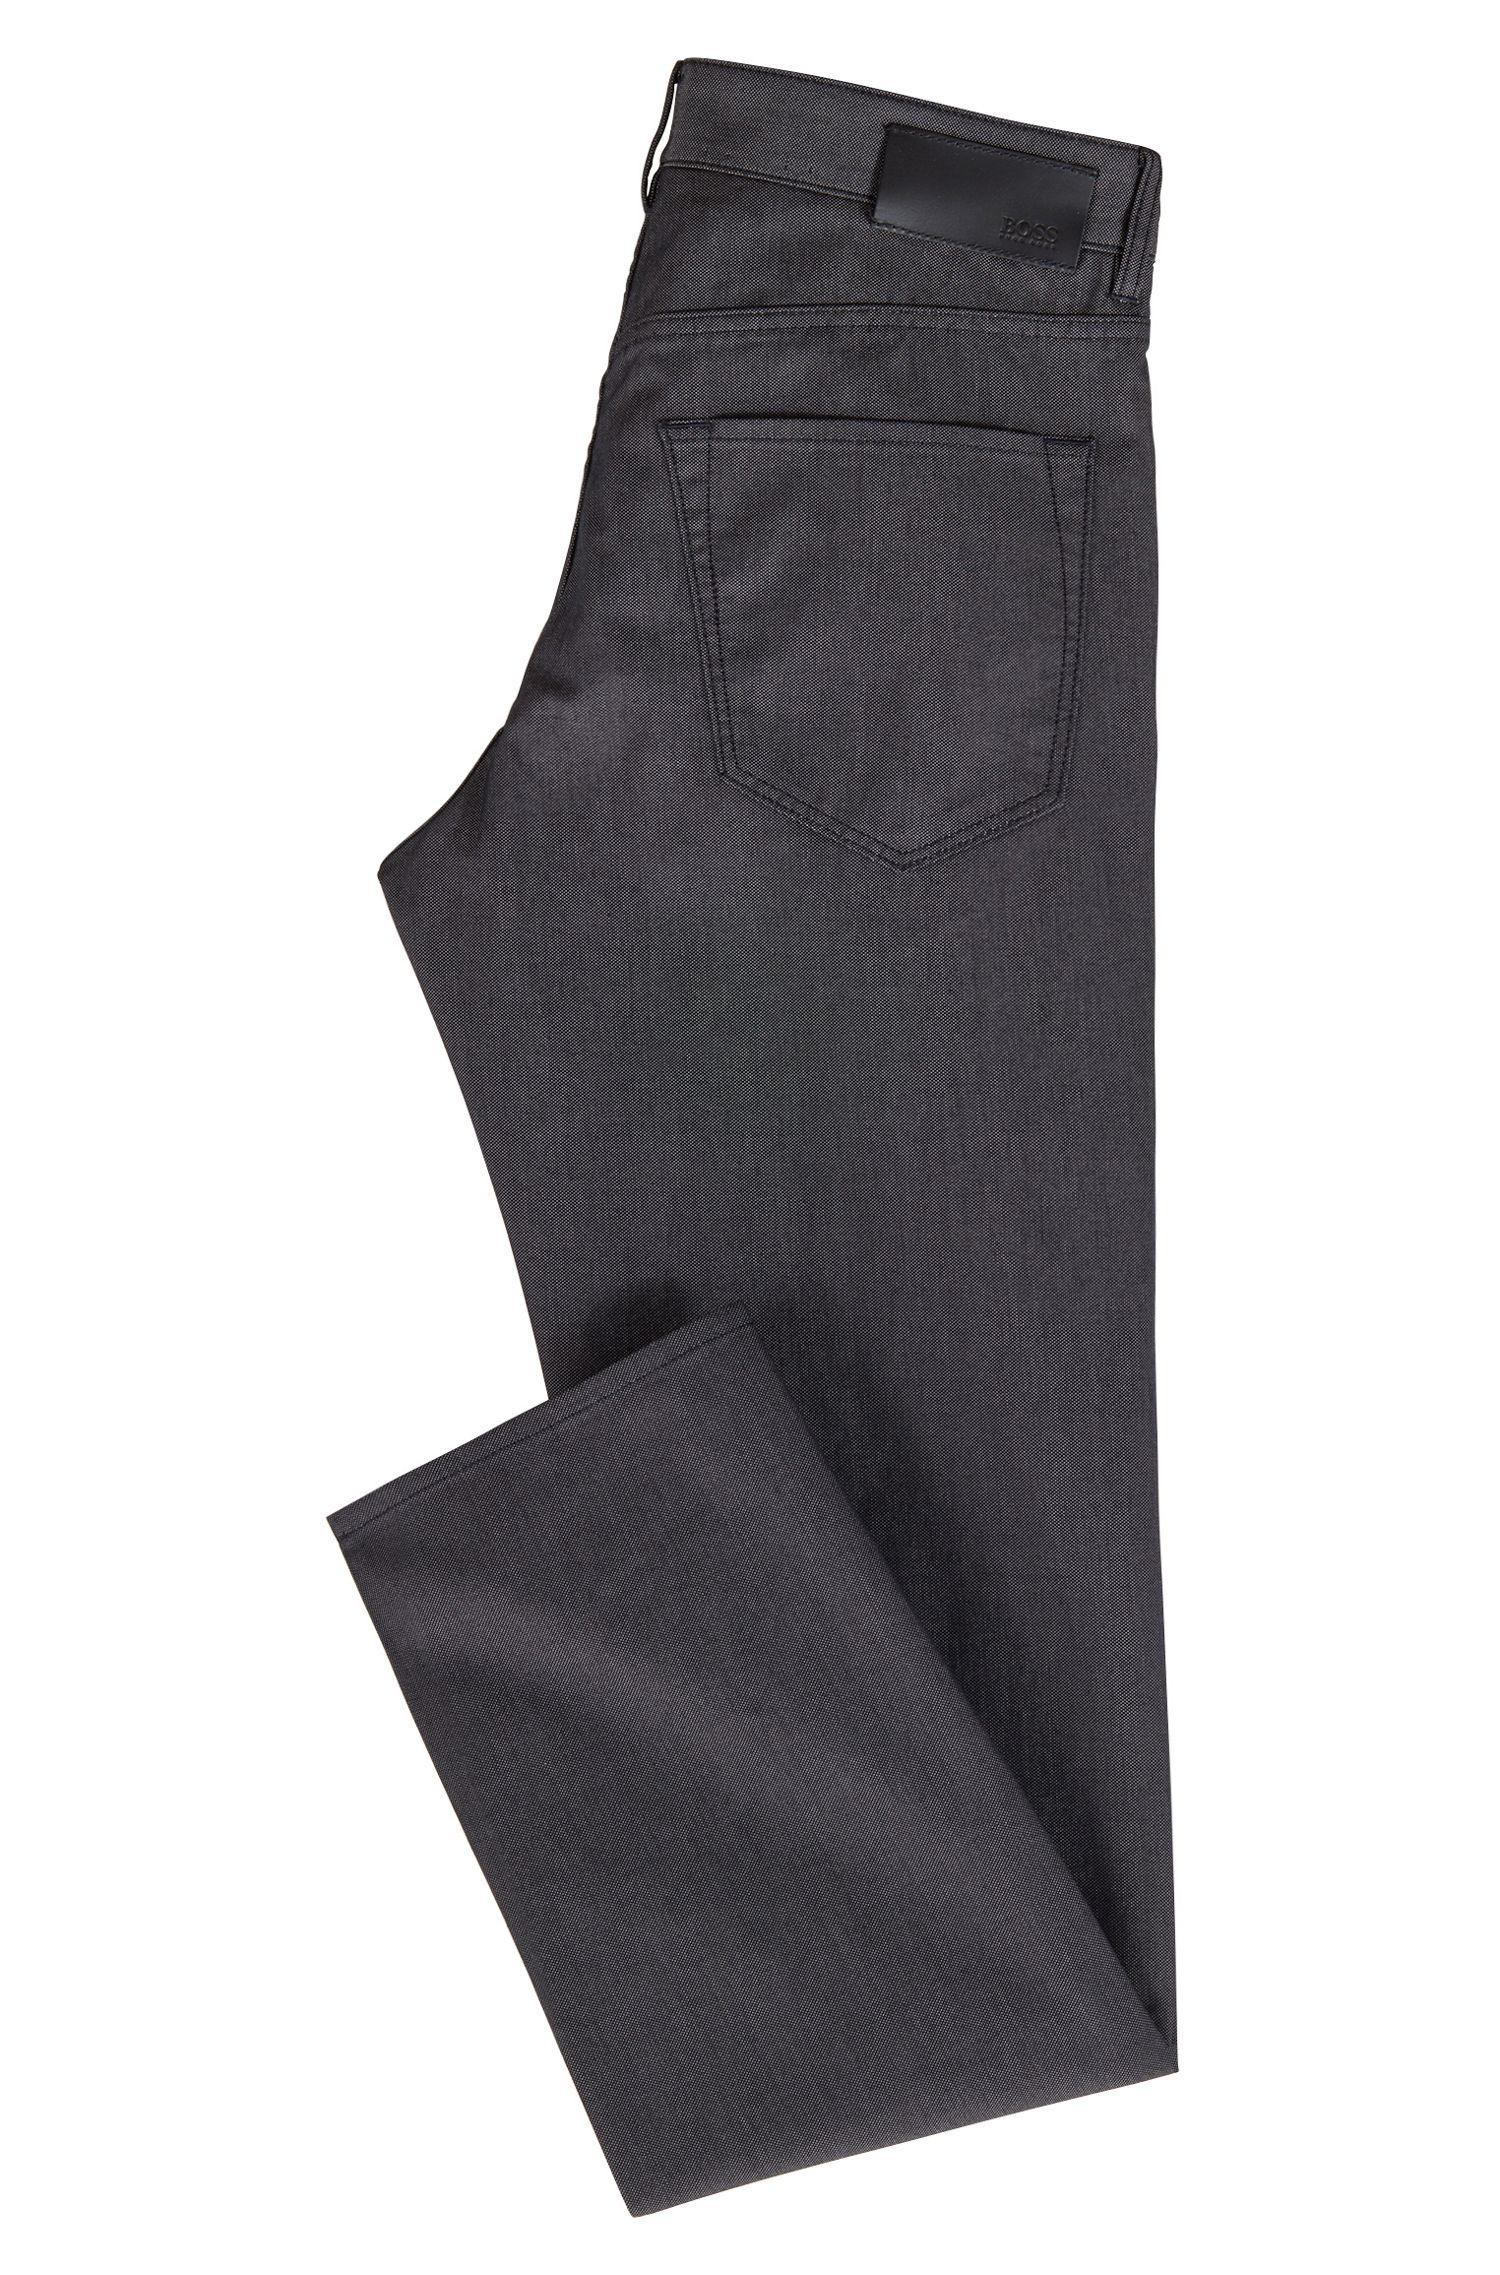 Regular-fit jeans in two-tone stretch denim, Black